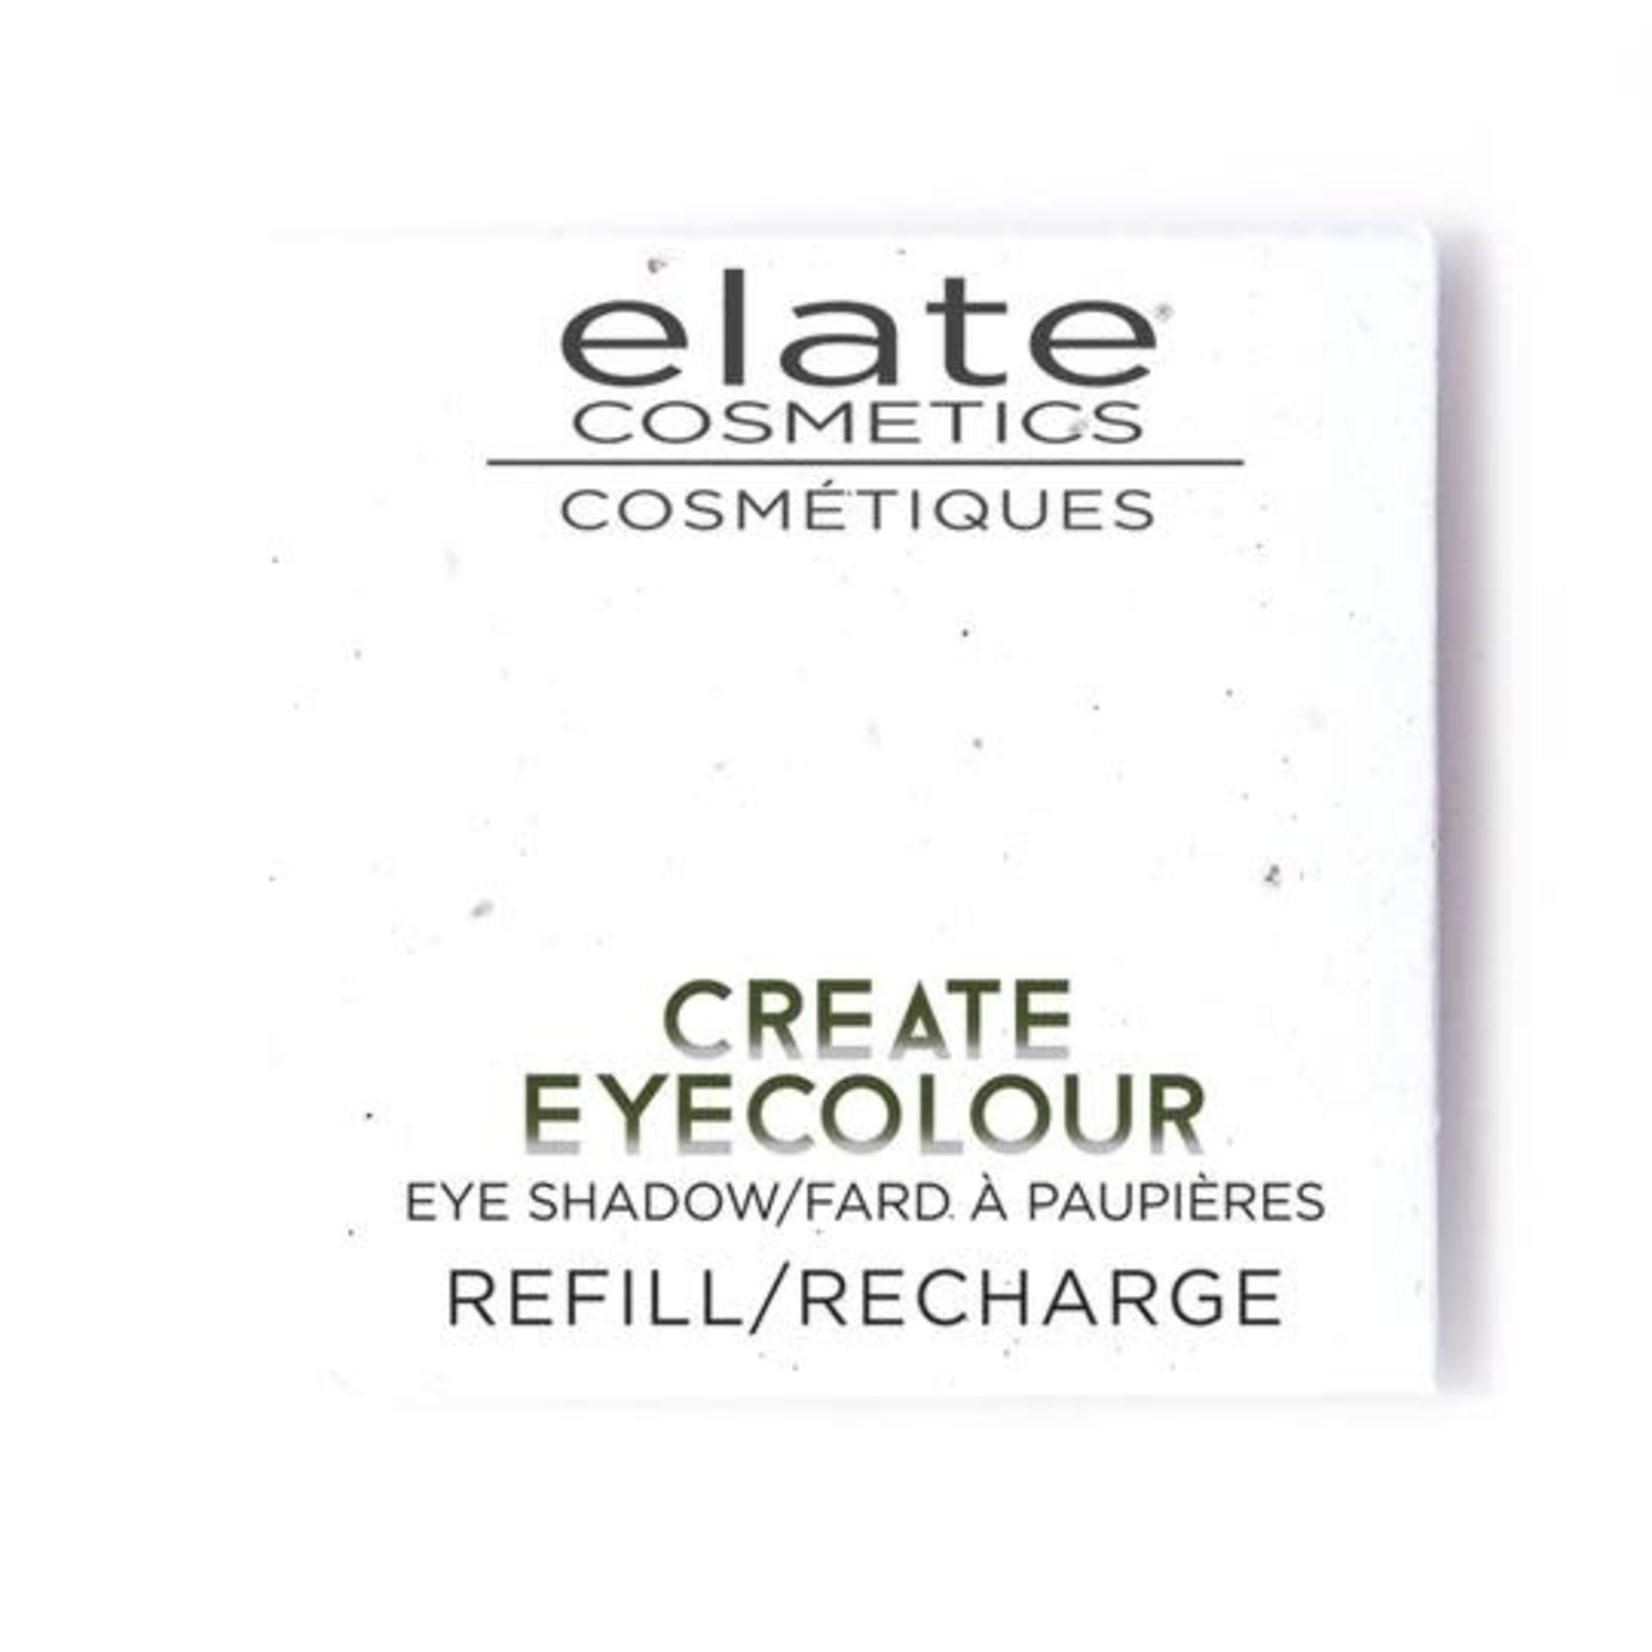 ELATE COSMETICS PRESSED EYECOLOUR - STONE